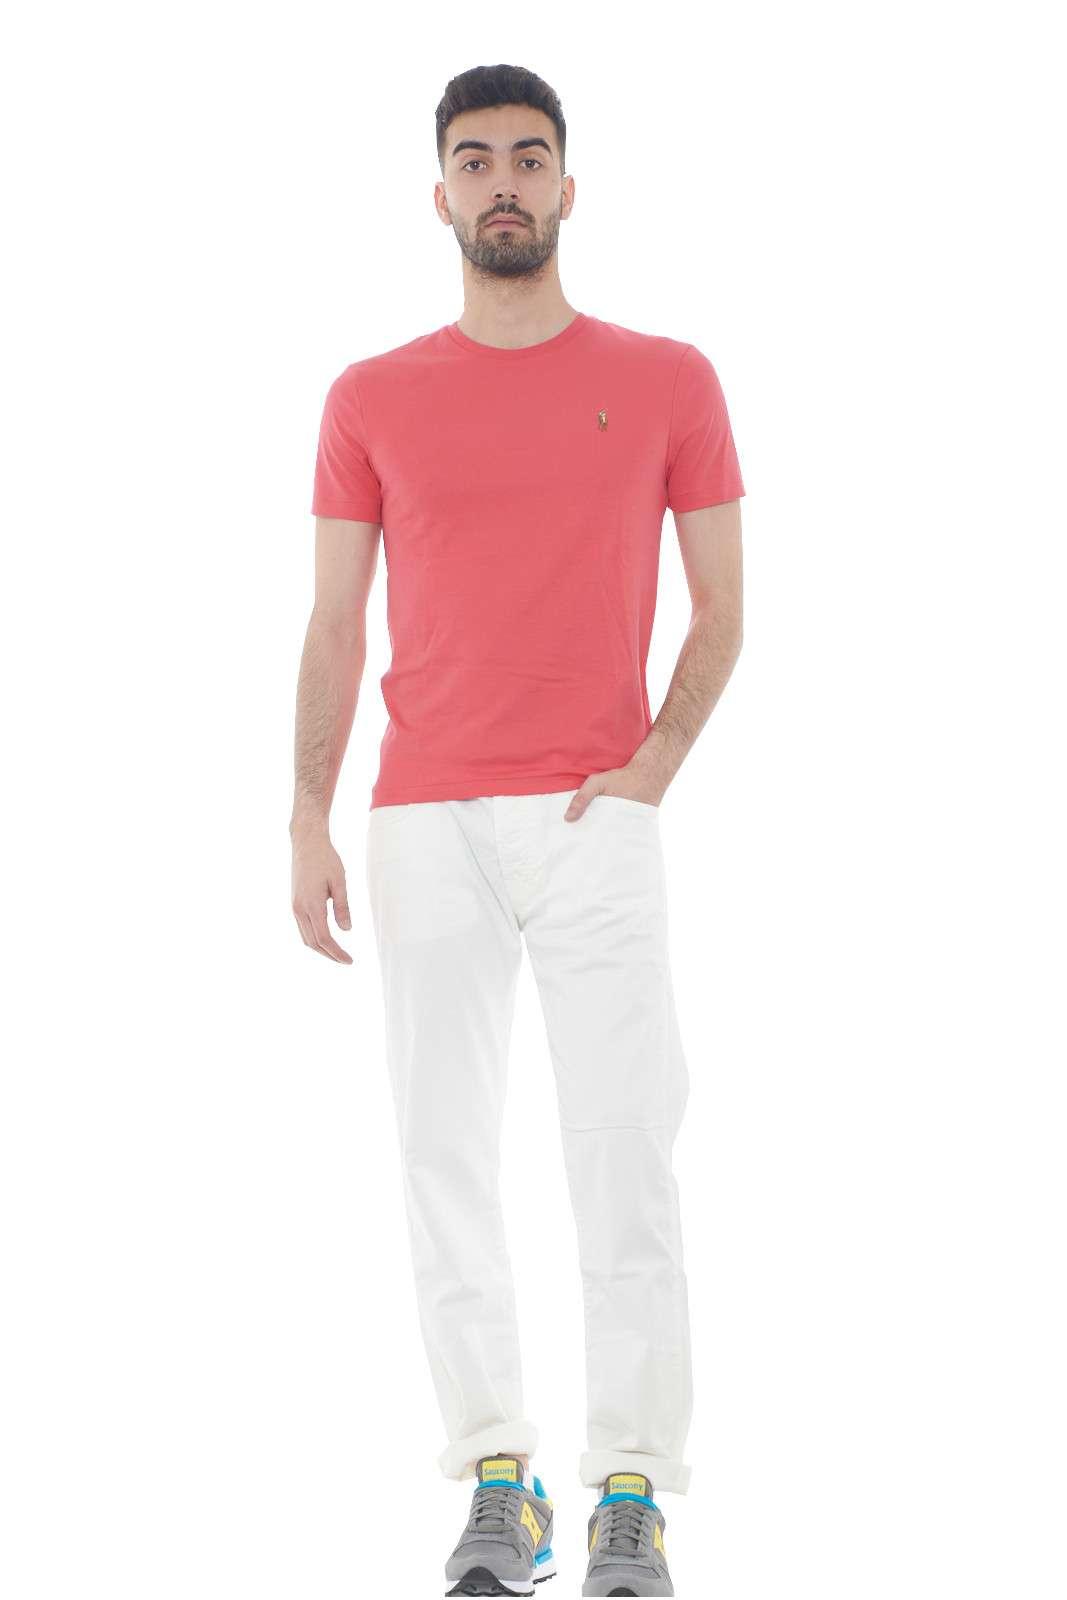 https://www.parmax.com/media/catalog/product/a/i/PE-outlet_parmax-t-shirt-uomo-Ralph-Lauren-710740727-D.jpg